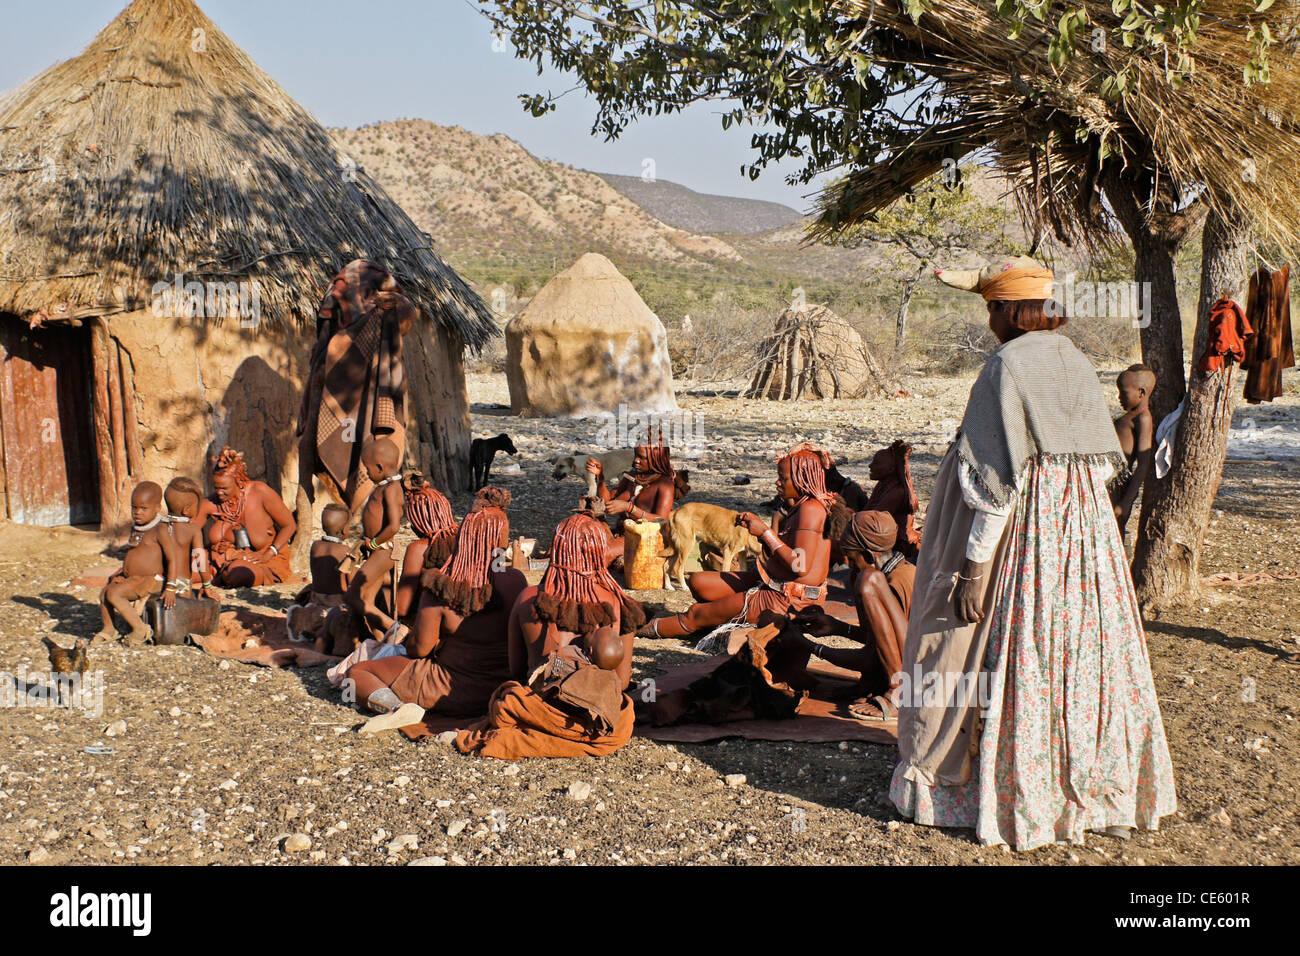 Herero woman and Himba people in Himba village near Opuwo, Namibia - Stock Image